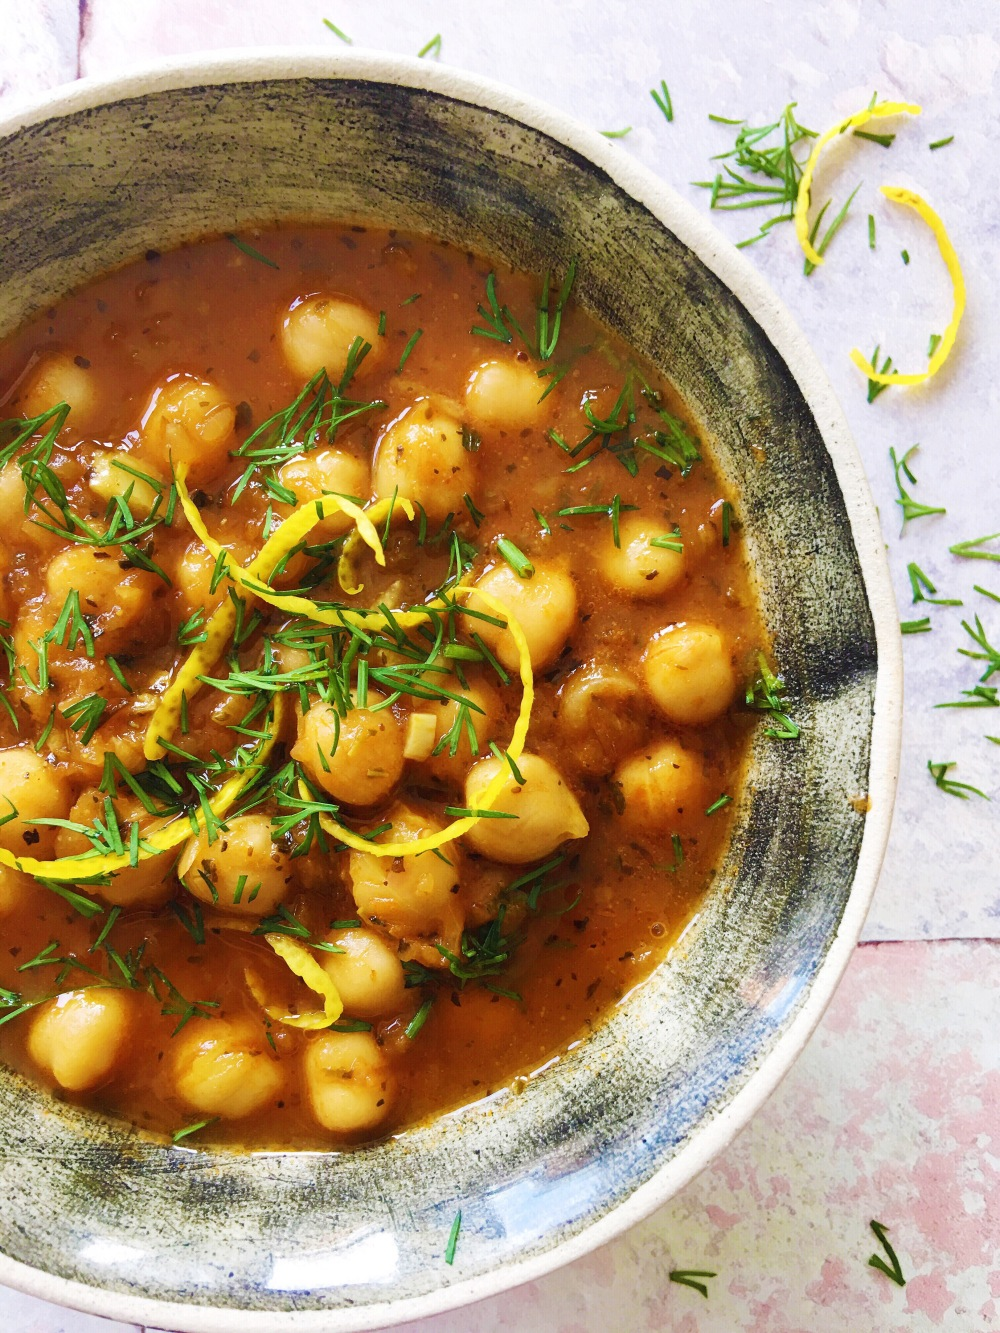 Rana's Chickpea Stew